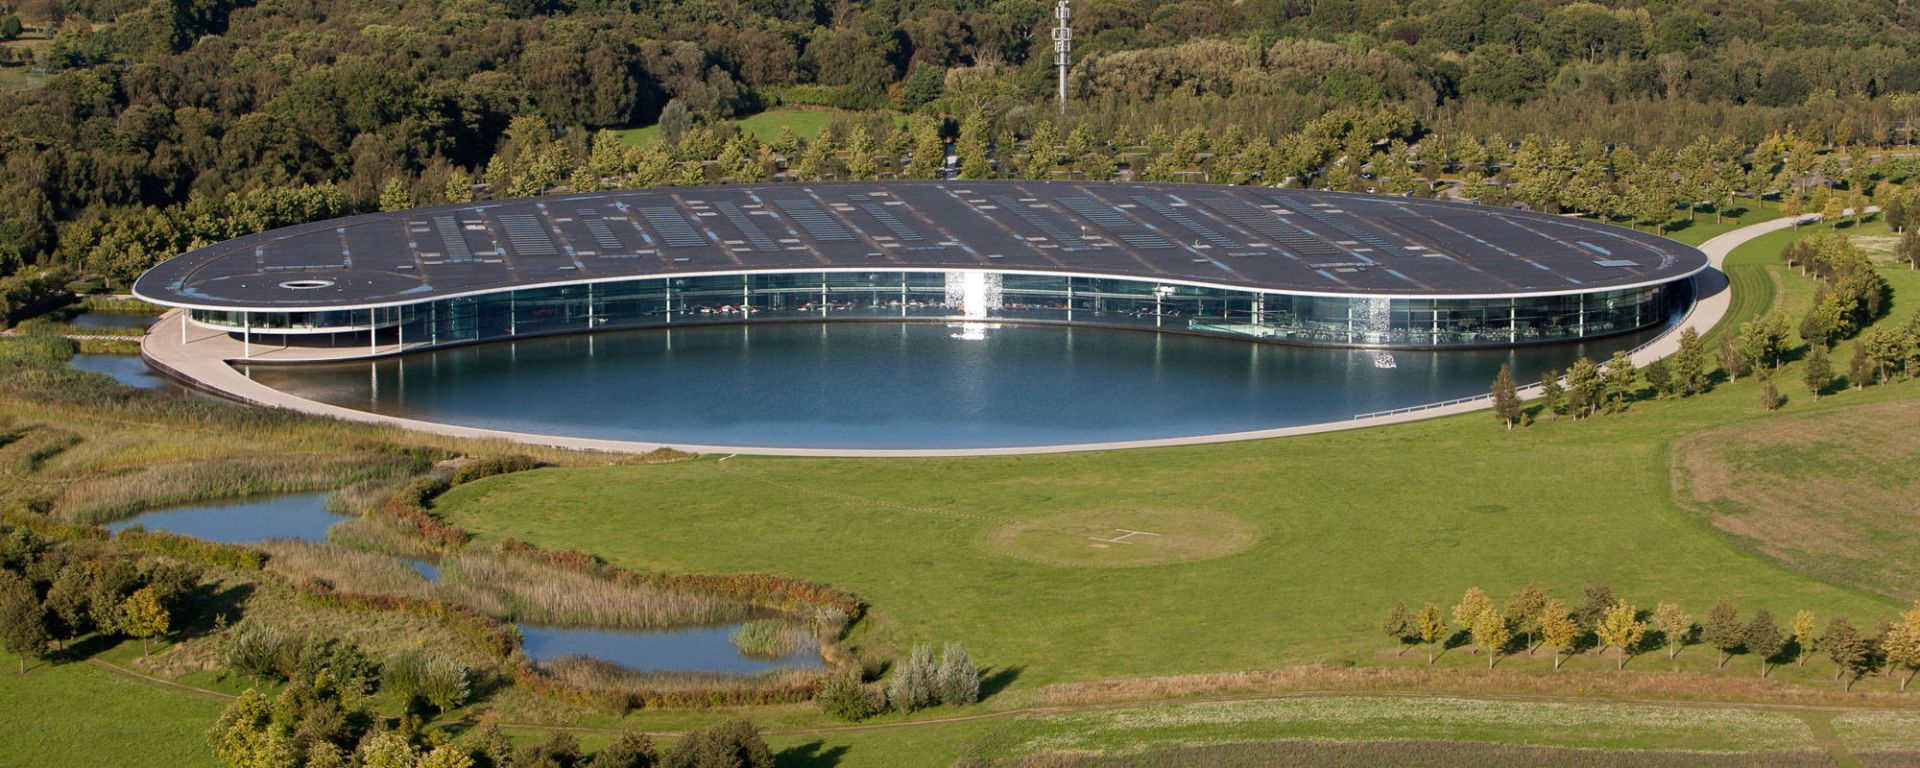 F1, l'avveniristica fabbrica della McLaren a Woking (McLaren Technology Centre)